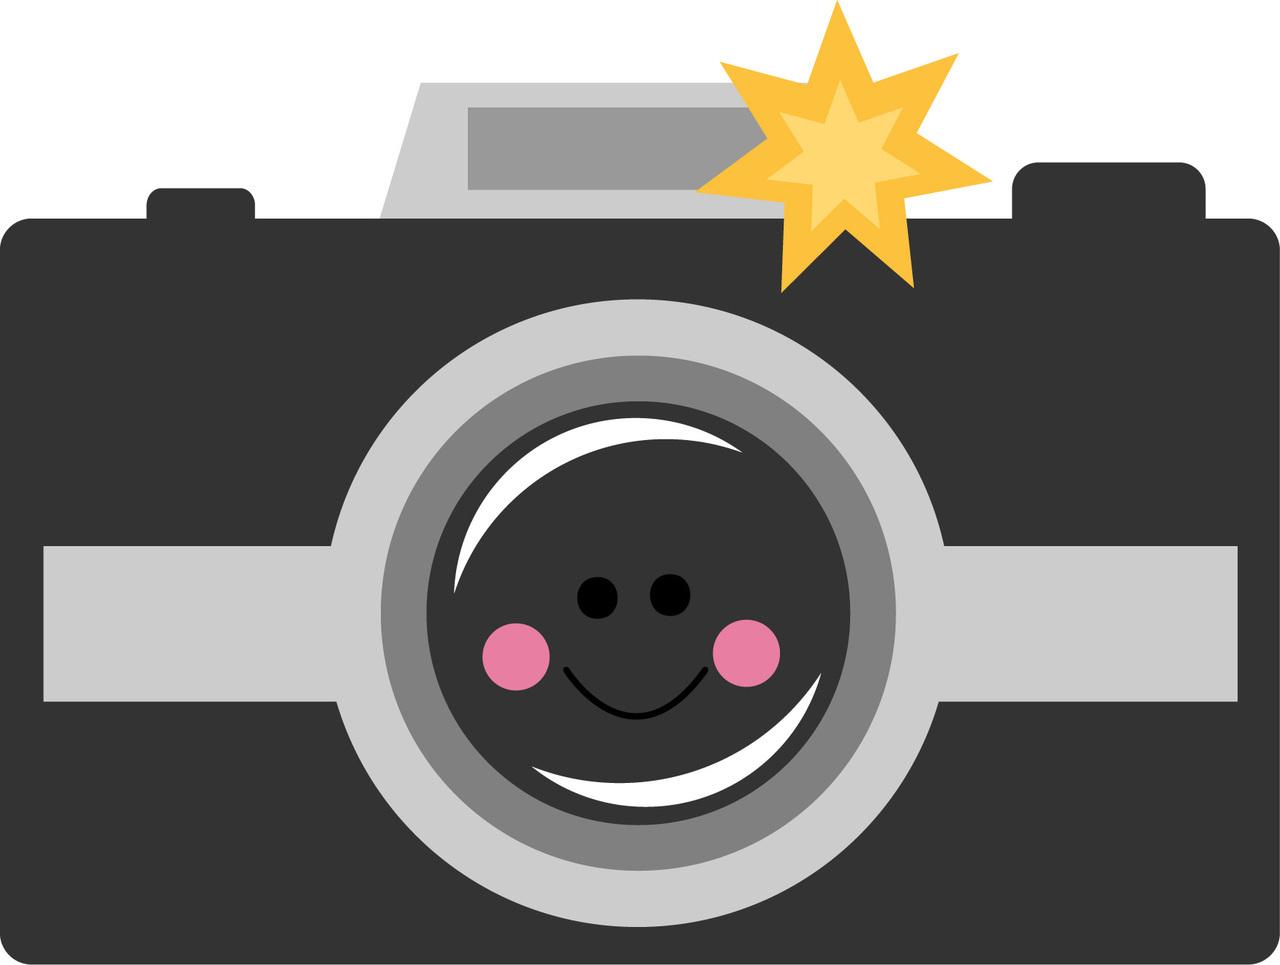 Smileys clipart camera Smiley (http://www Camera Smiley $0